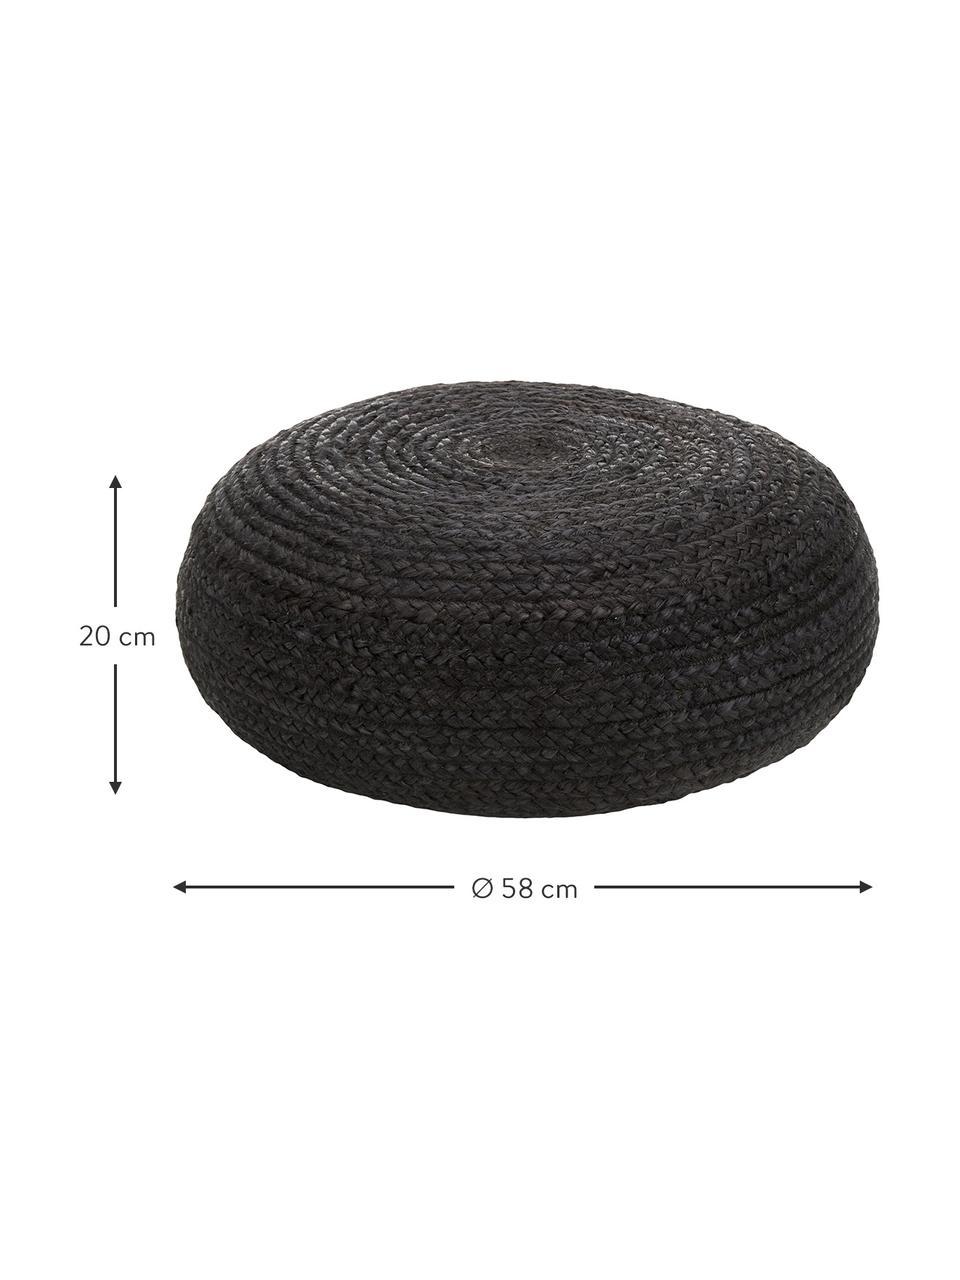 Handgefertigter Pouf Bono aus Jute, Bezug: Jute, Schwarz, Ø 61 x H 21 cm